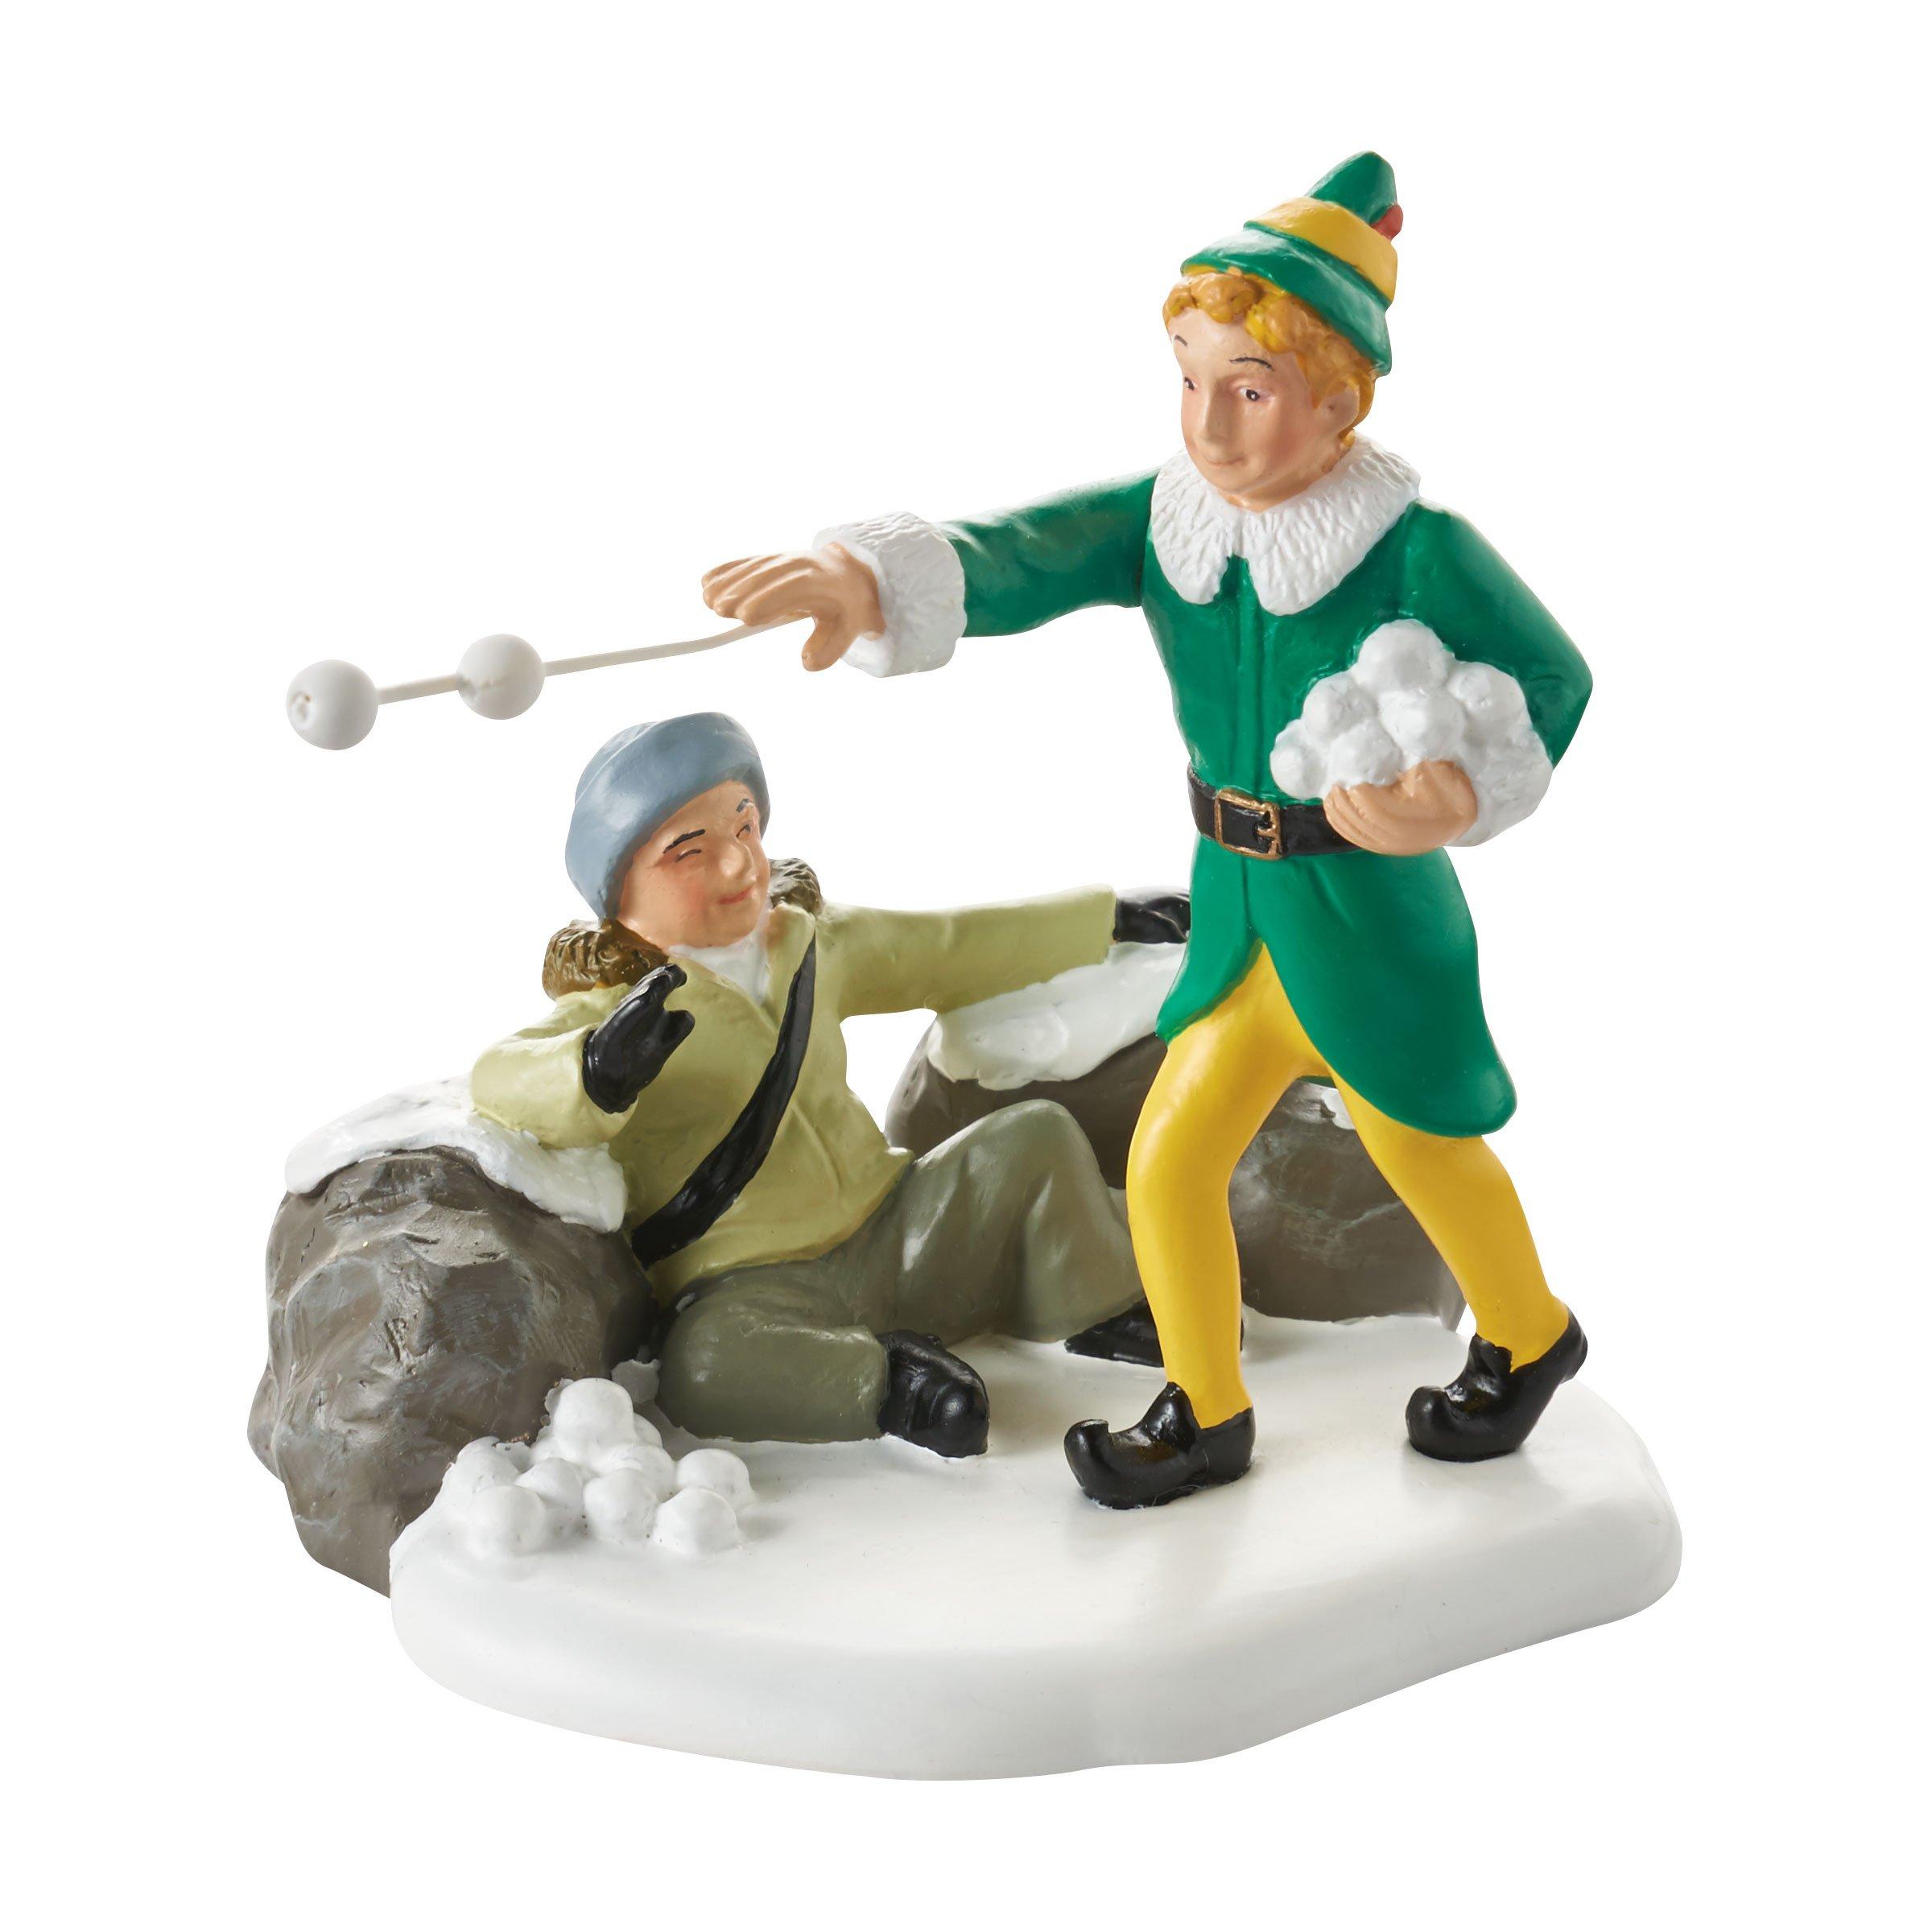 Department 56 Elf the Movie Village Accessory Snowball Fight Figurine, 2.75 inch